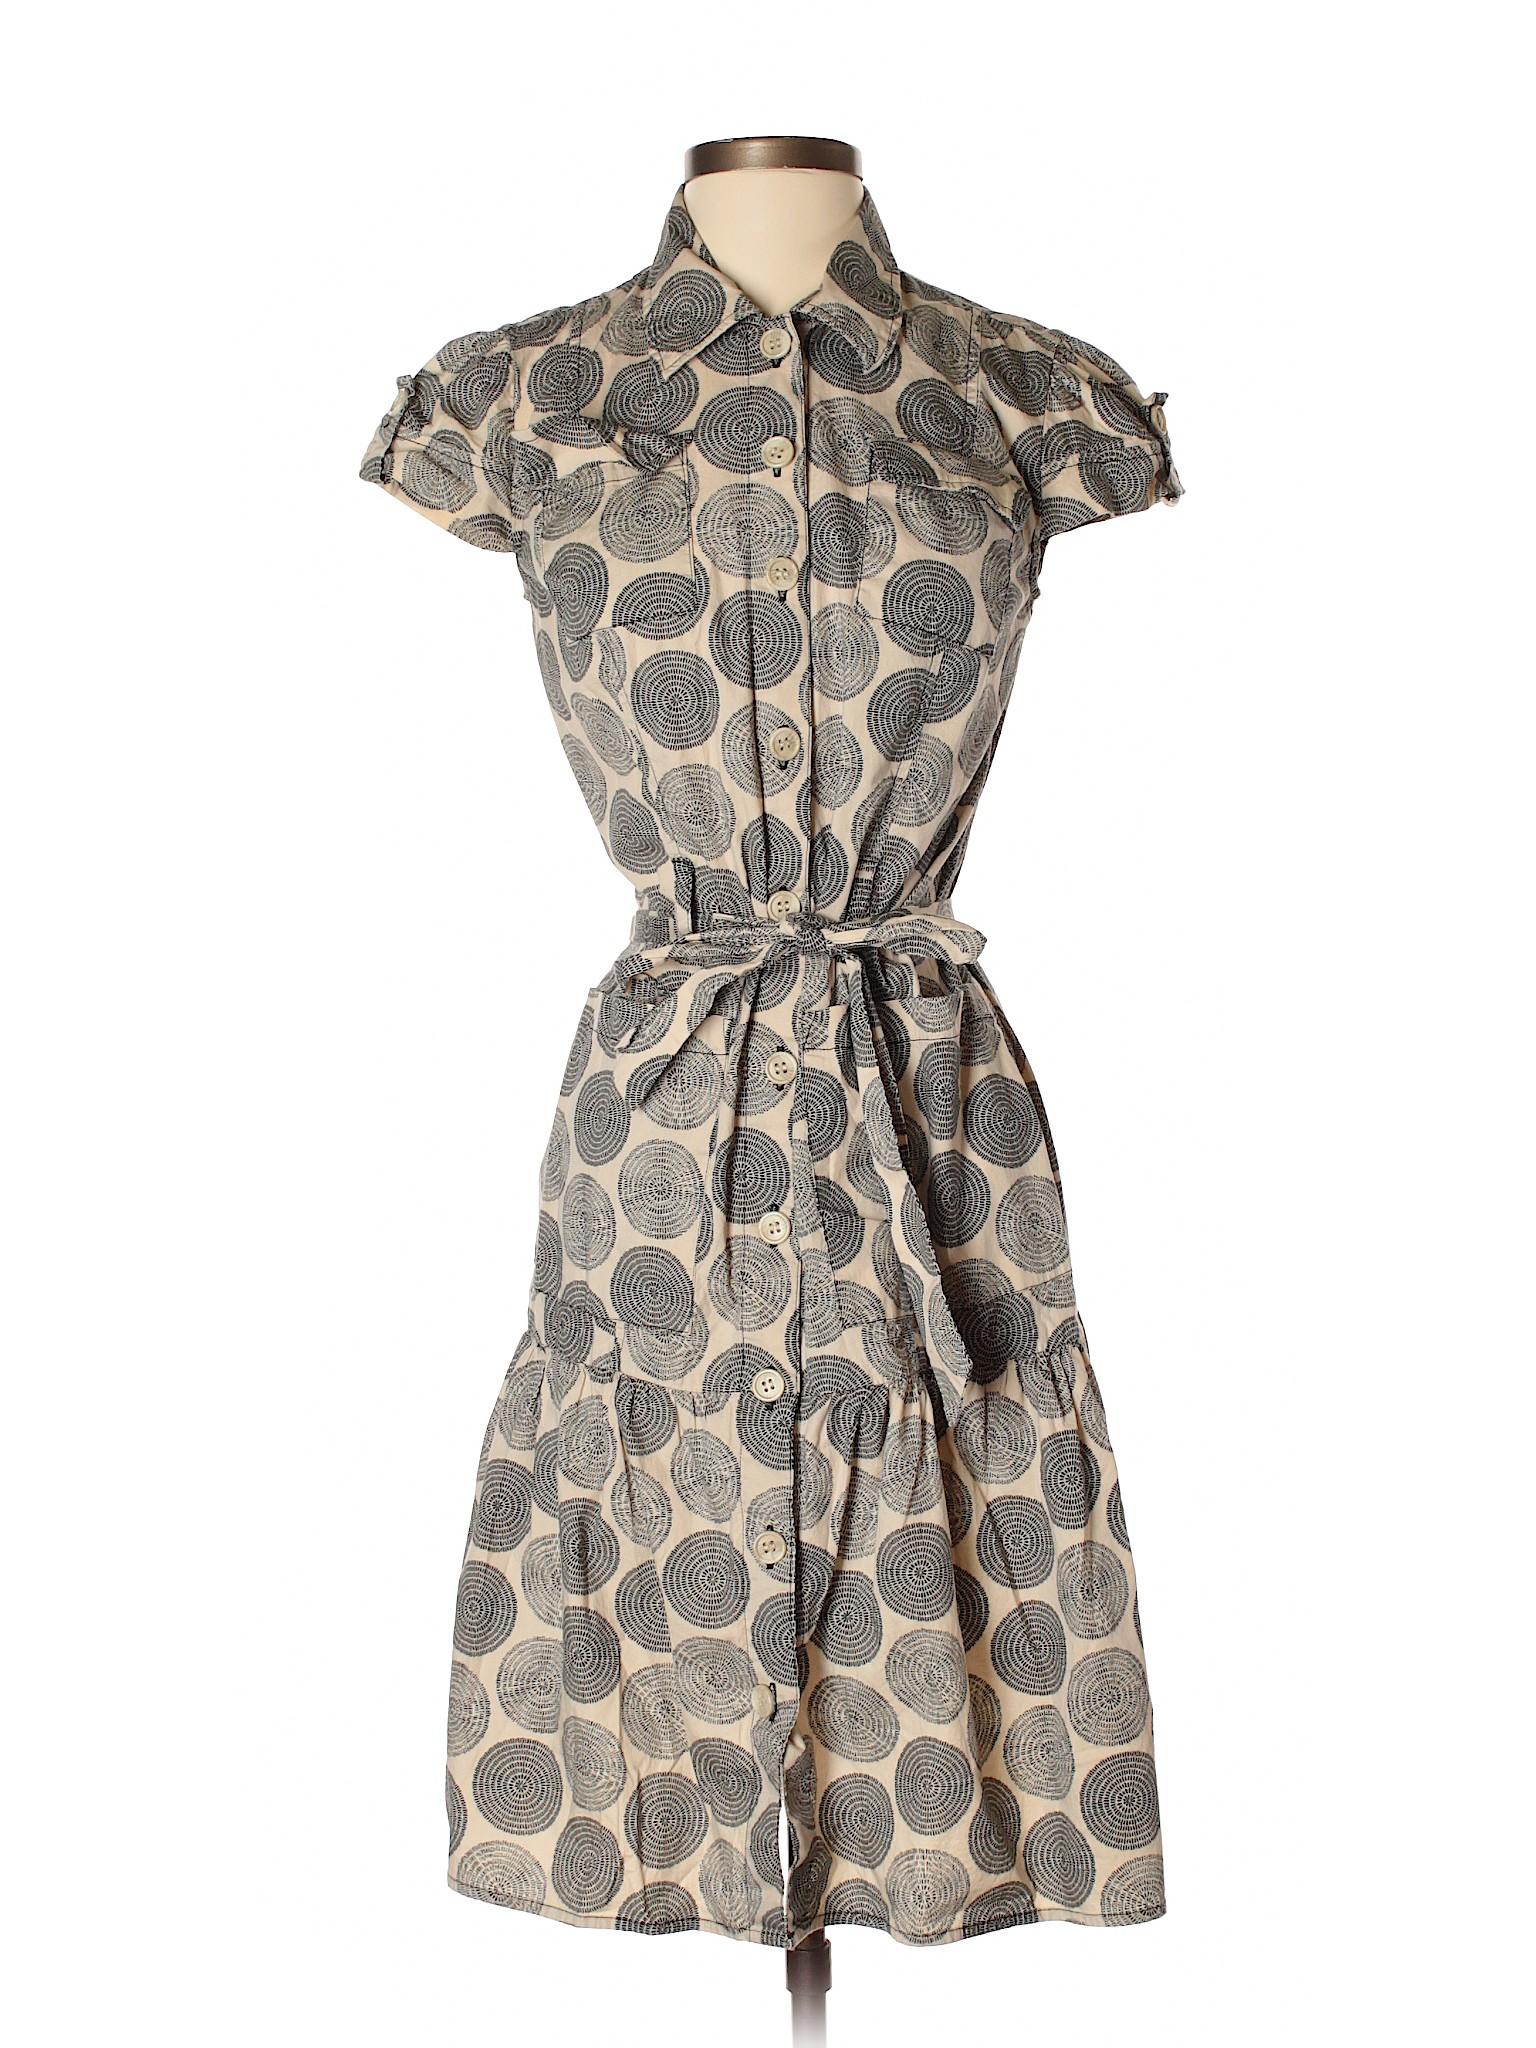 Boutique Casual Merona winter Dress winter Boutique 8wxq876S